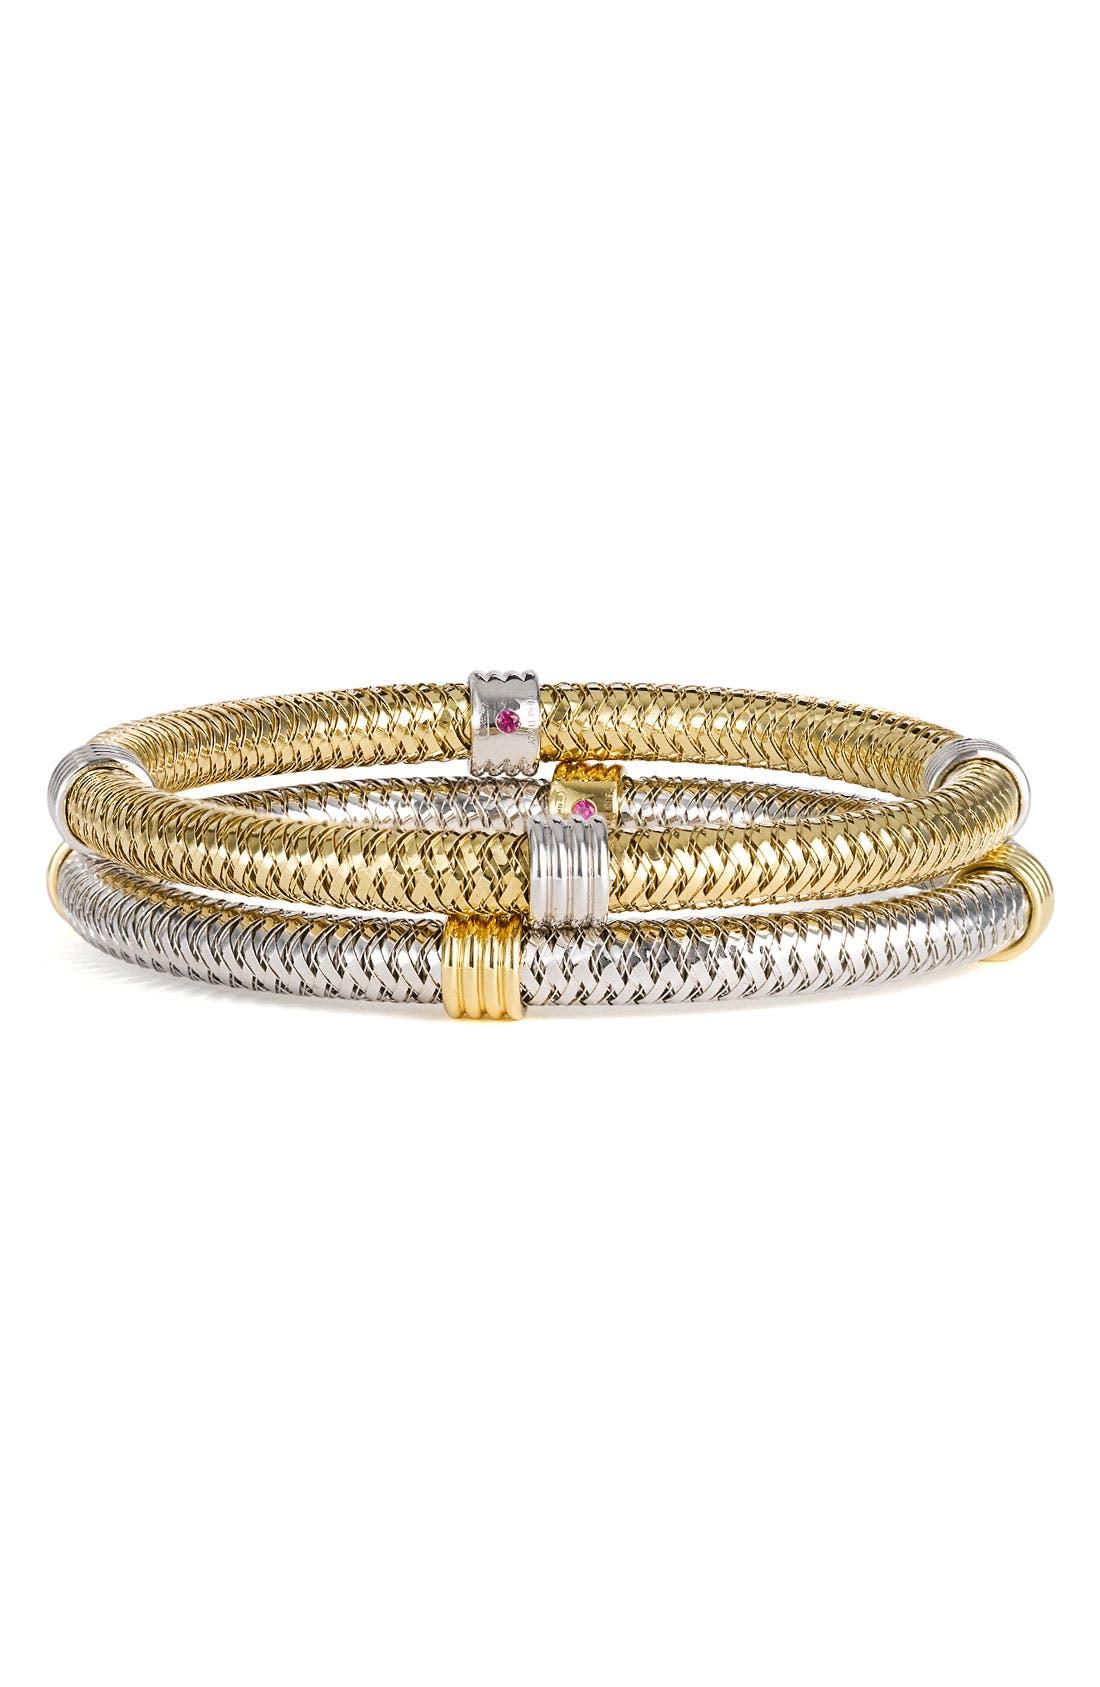 Alternate Image 1 Selected - Roberto Coin 'Primavera' Gold Stackable Bracelet